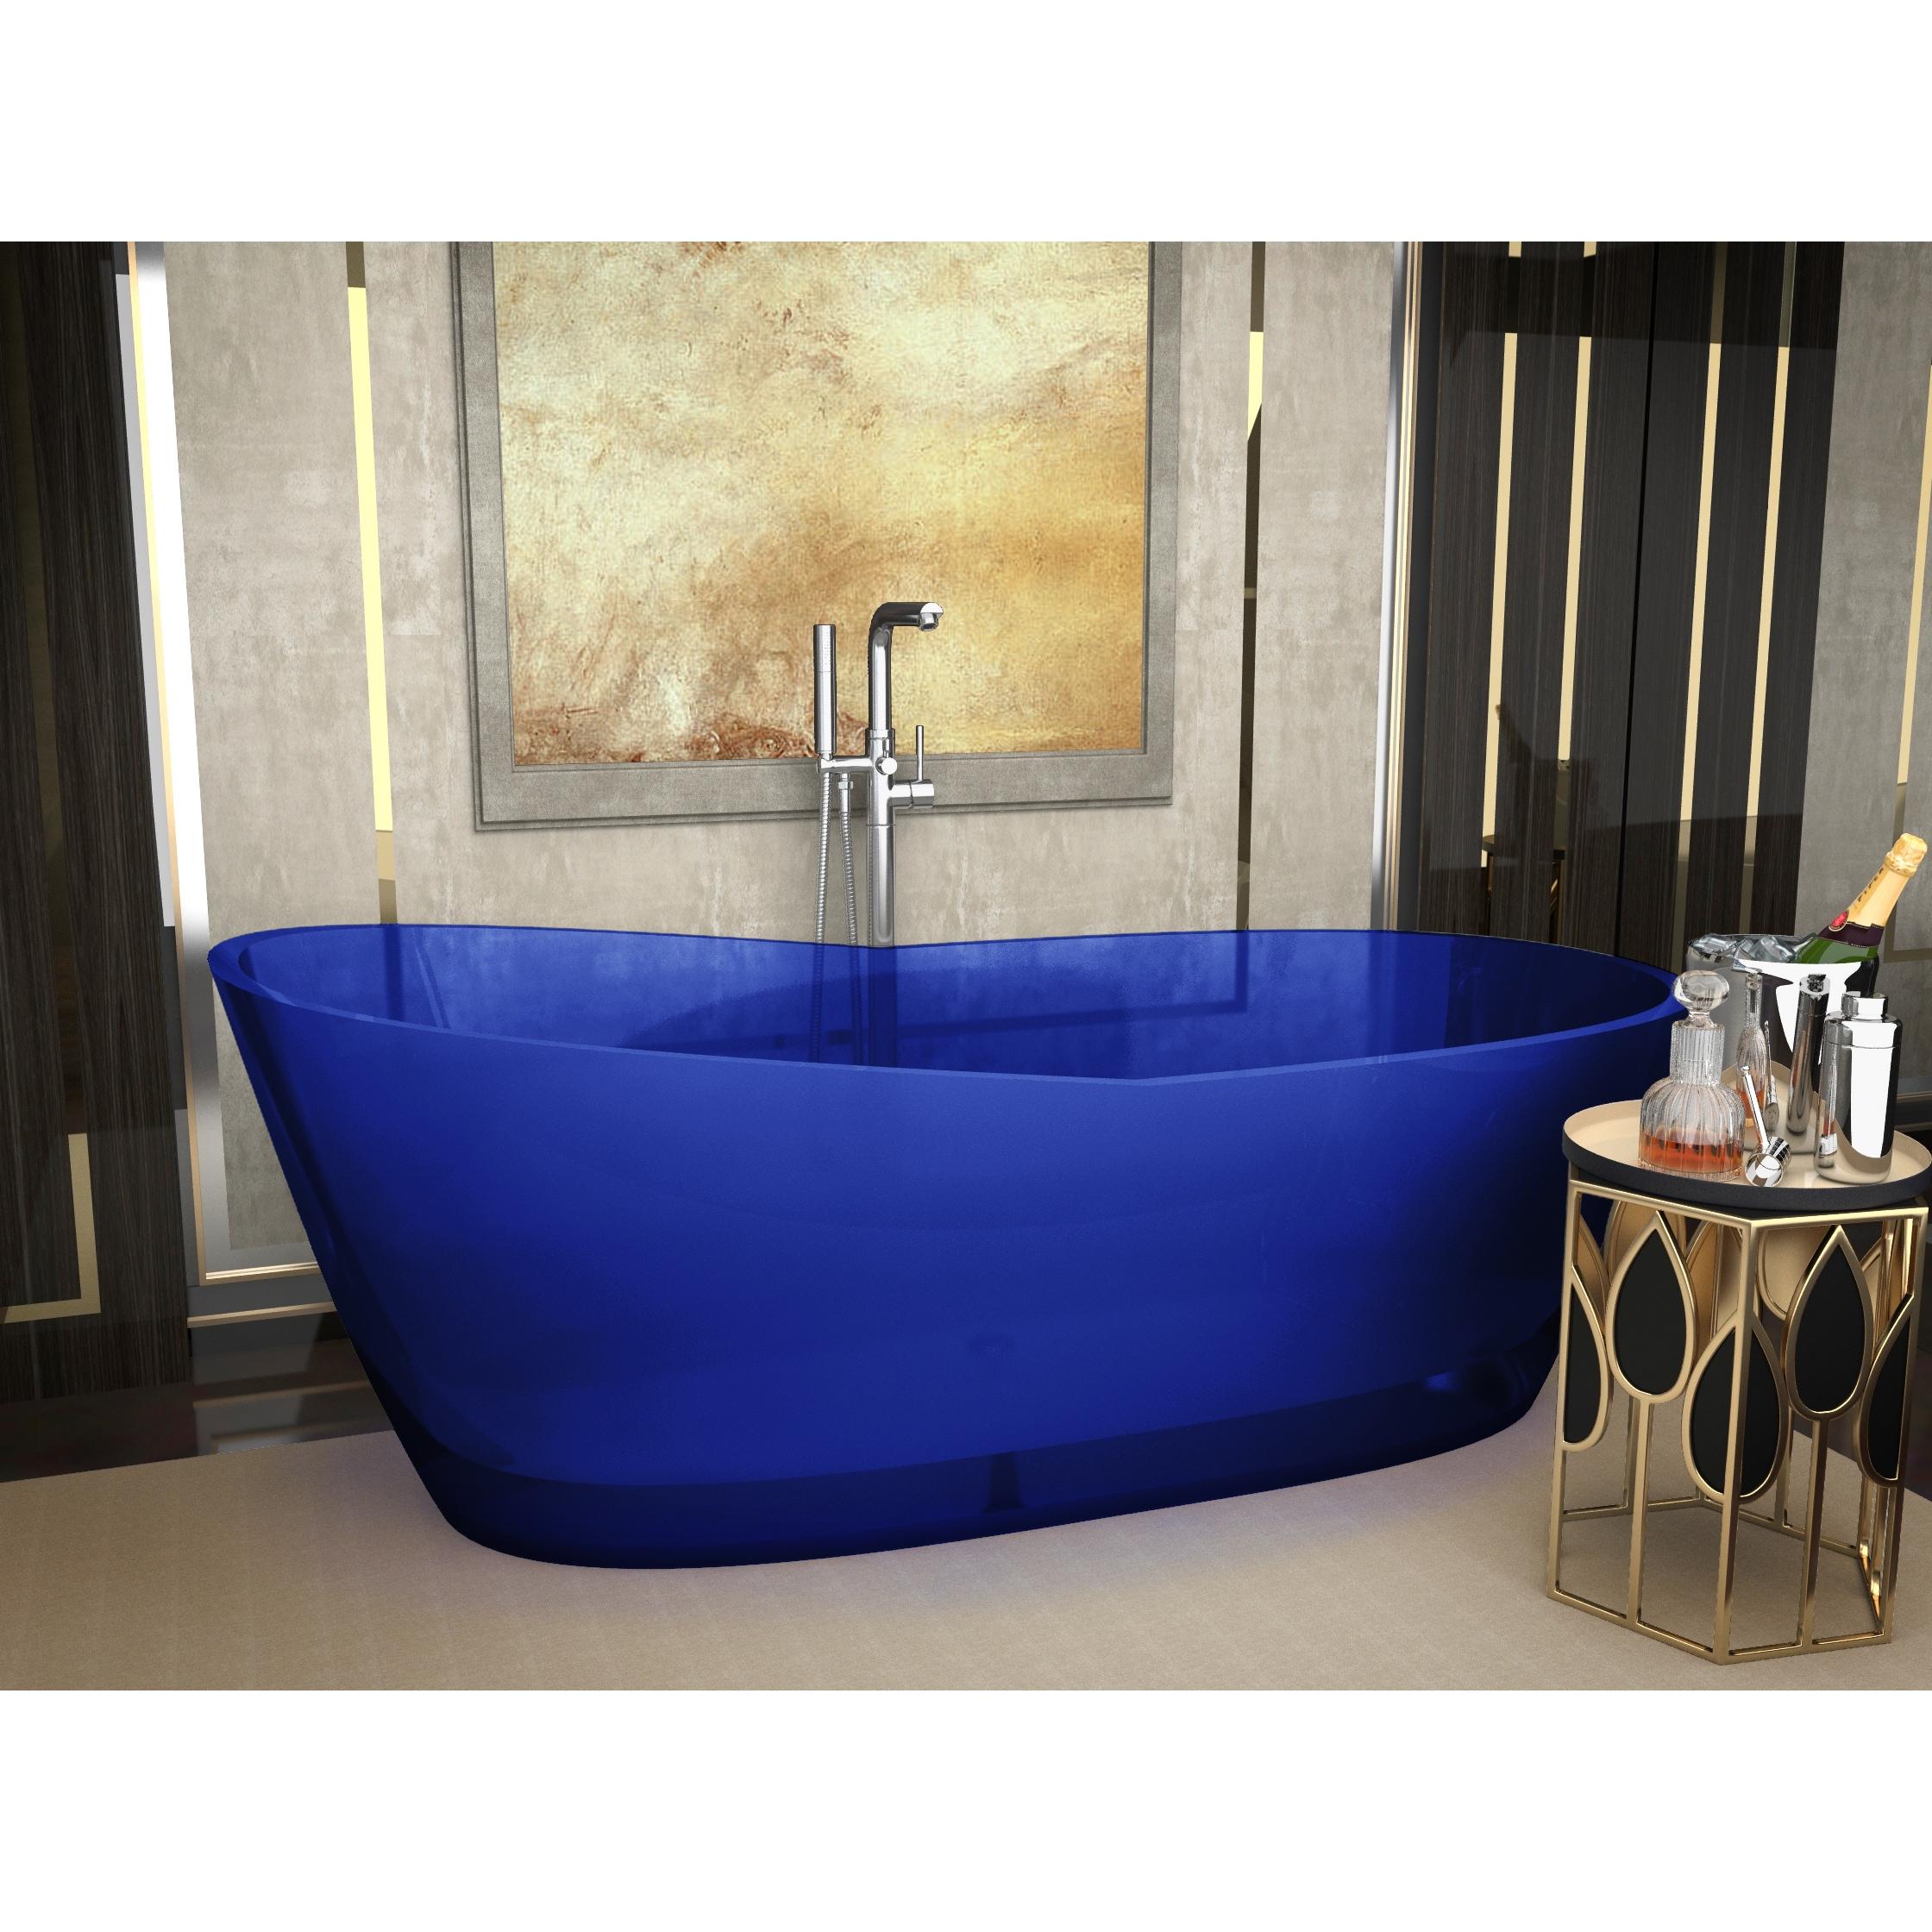 ANZZI Ember 5.4 ft. Man-Made Stone Center Drain Freestanding Bathtub ...